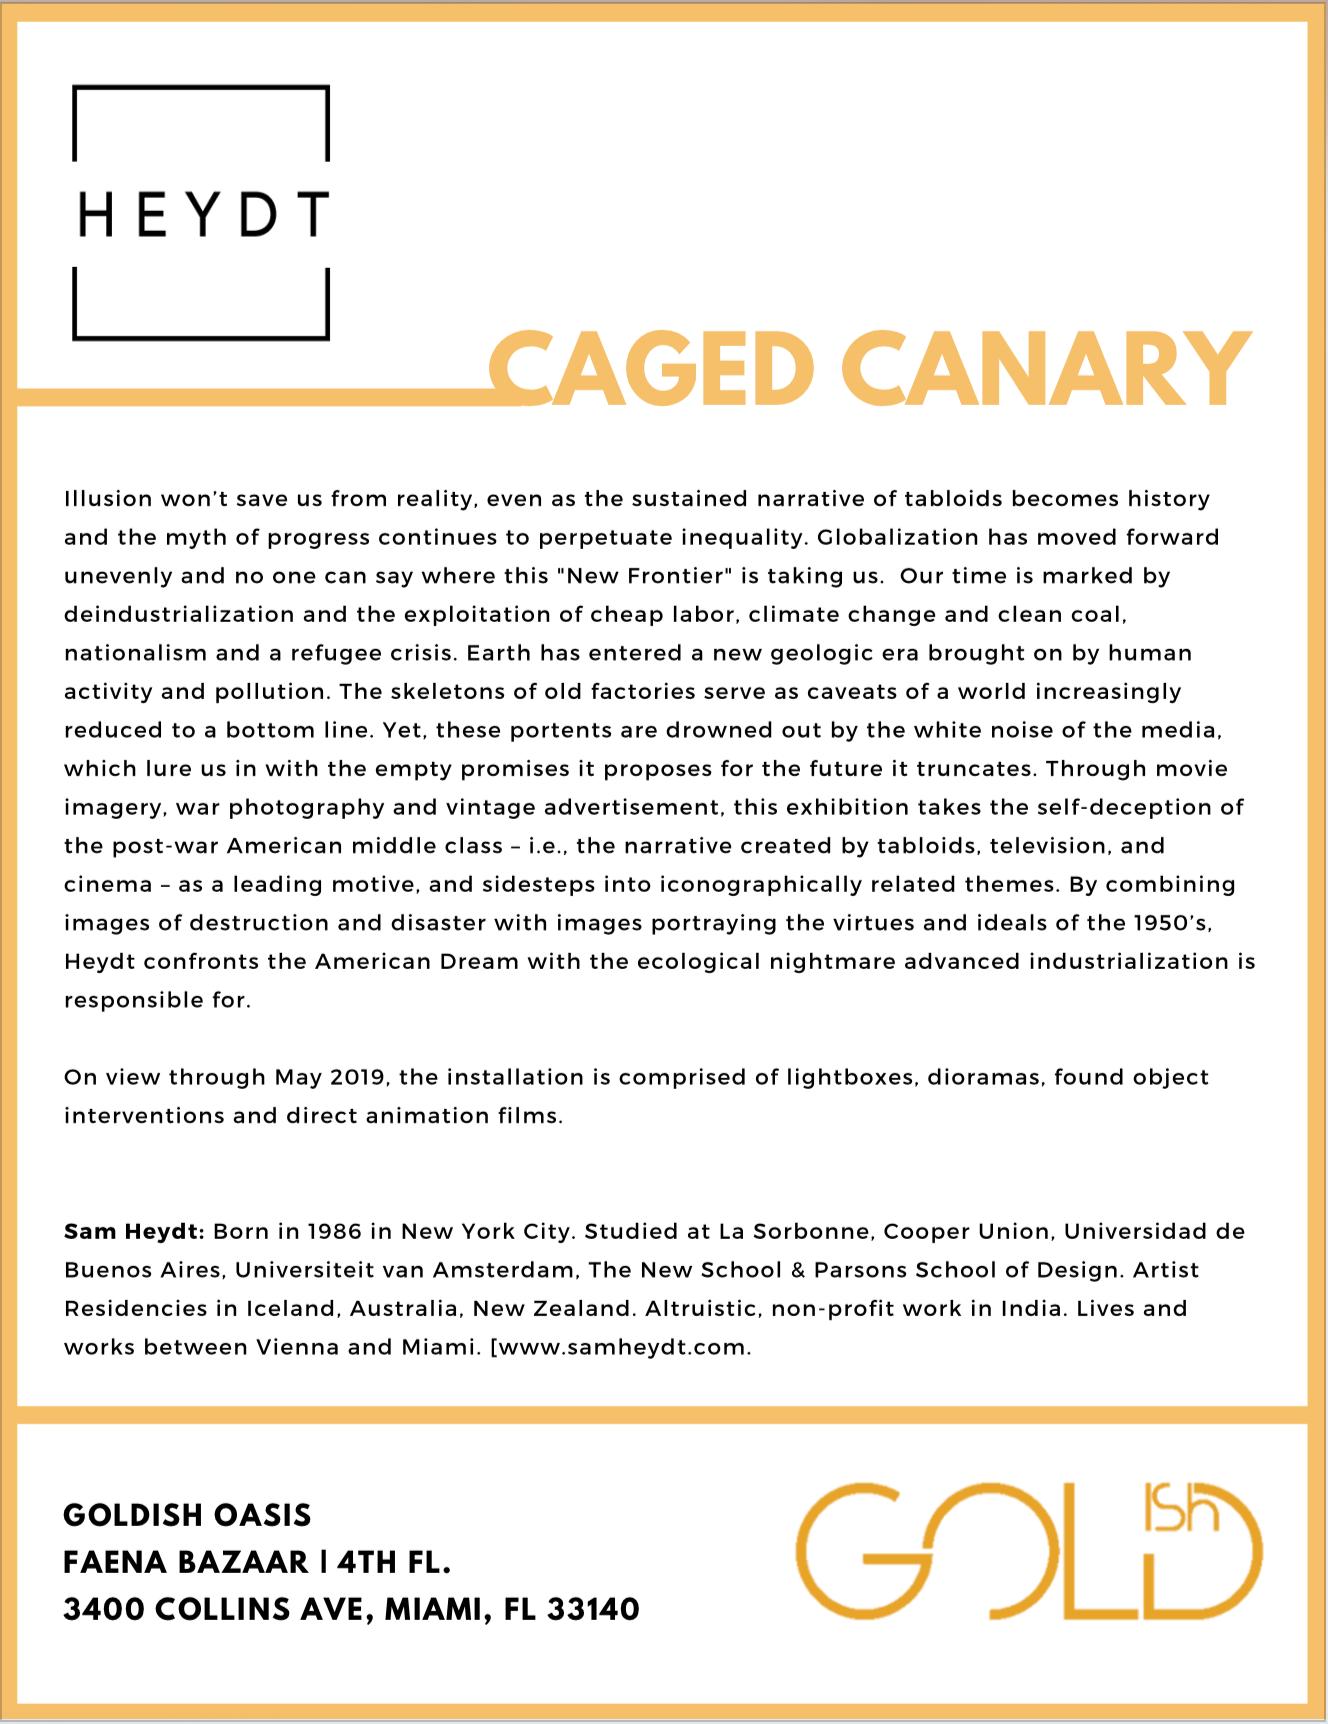 HEYDT - Press Release - Goldish Oasis